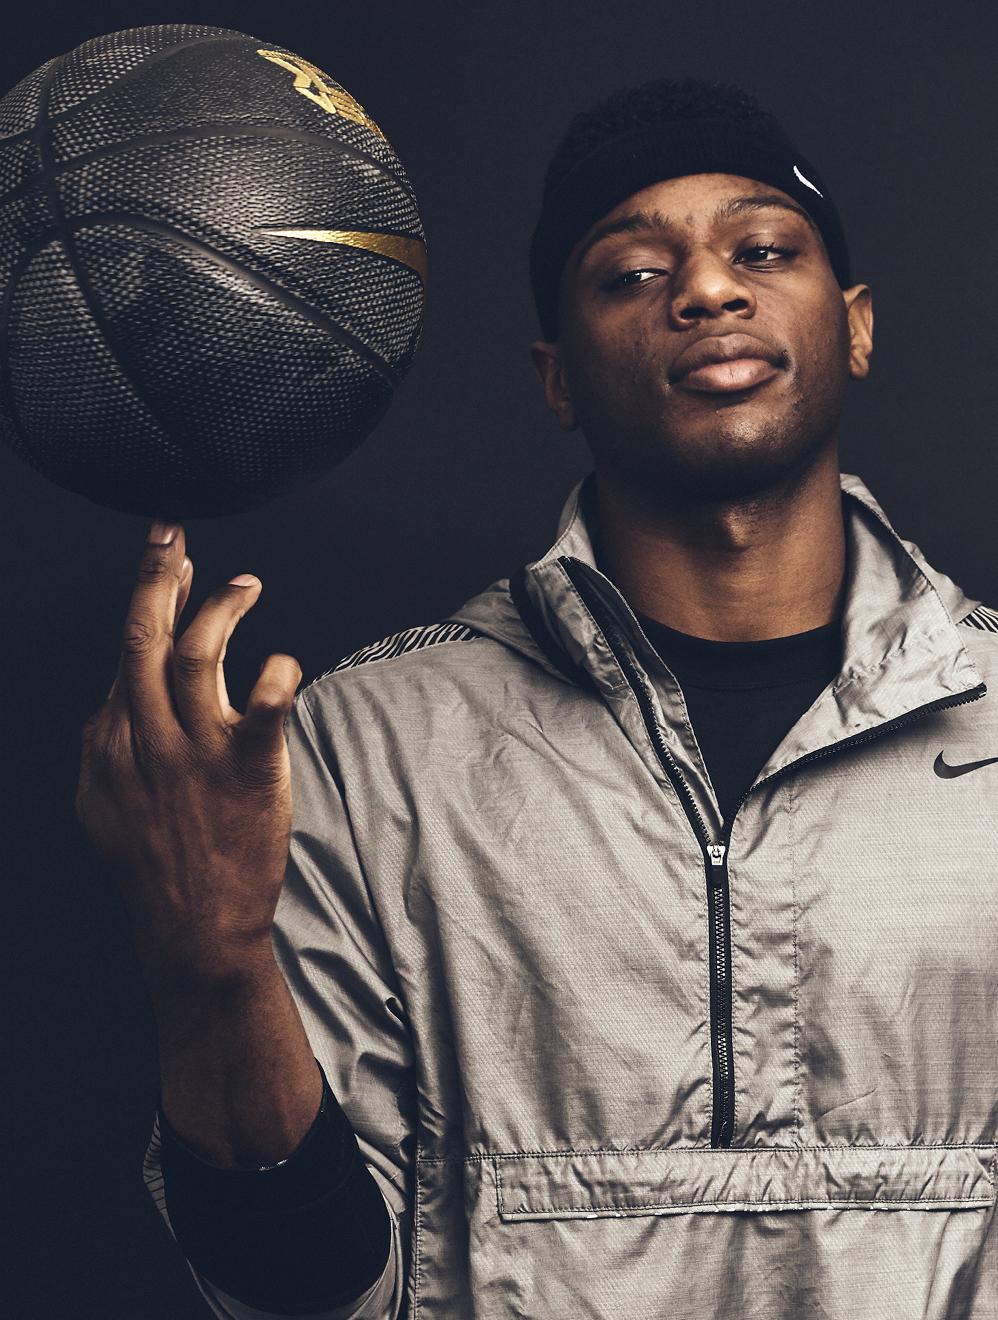 Everett_Aaron_Okayama_Basketball72.jpg